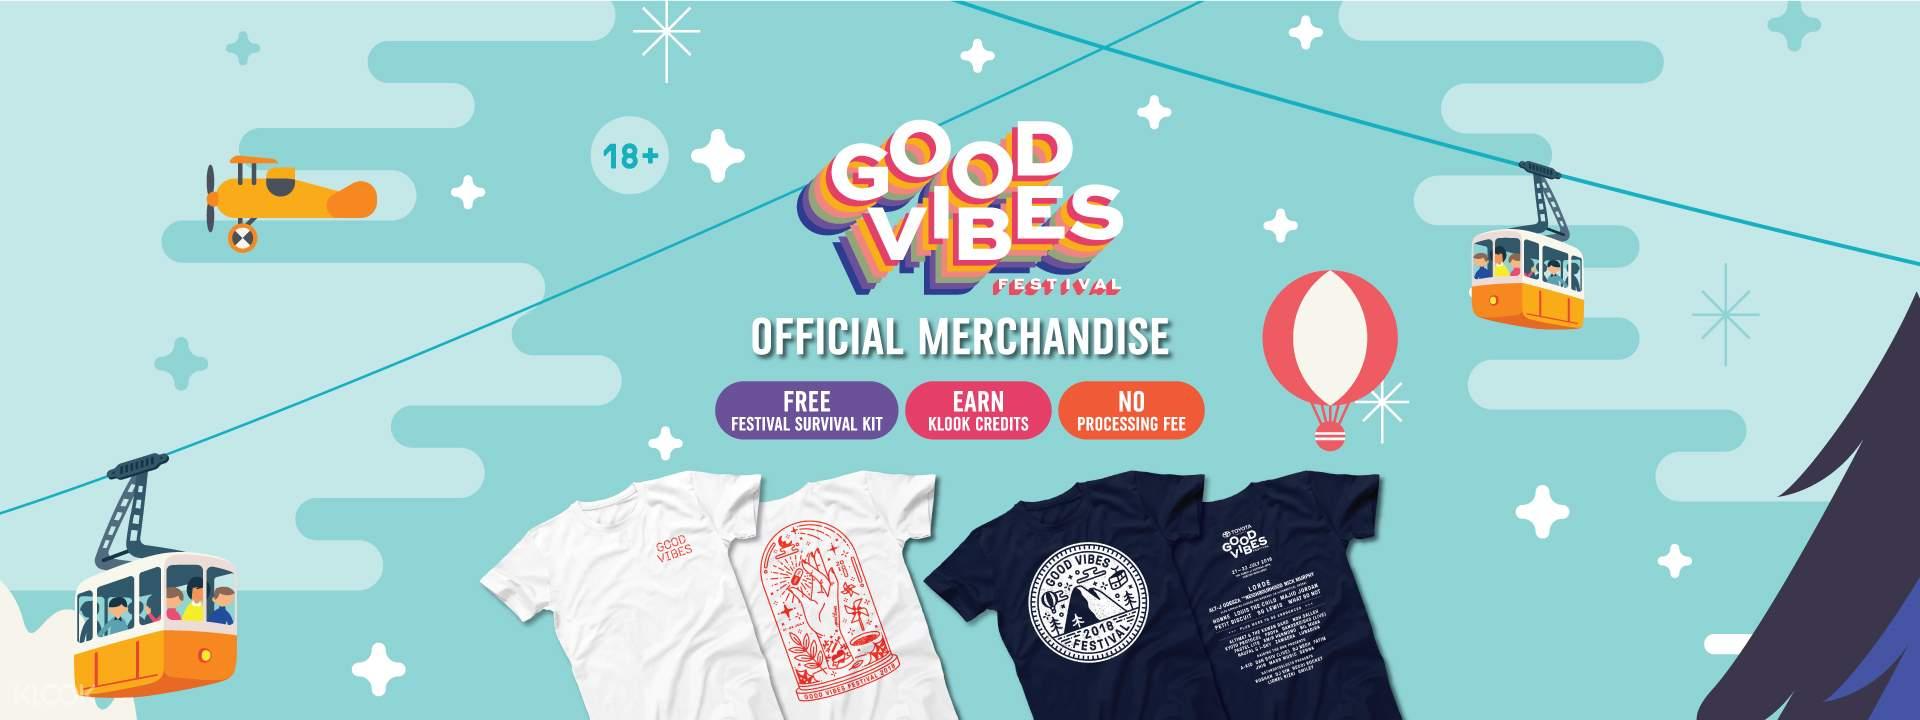 Good Vibes Festival 2018 Exclusive T Shirt Pre Order Kuala Lumpur Sorban Long Black Log In